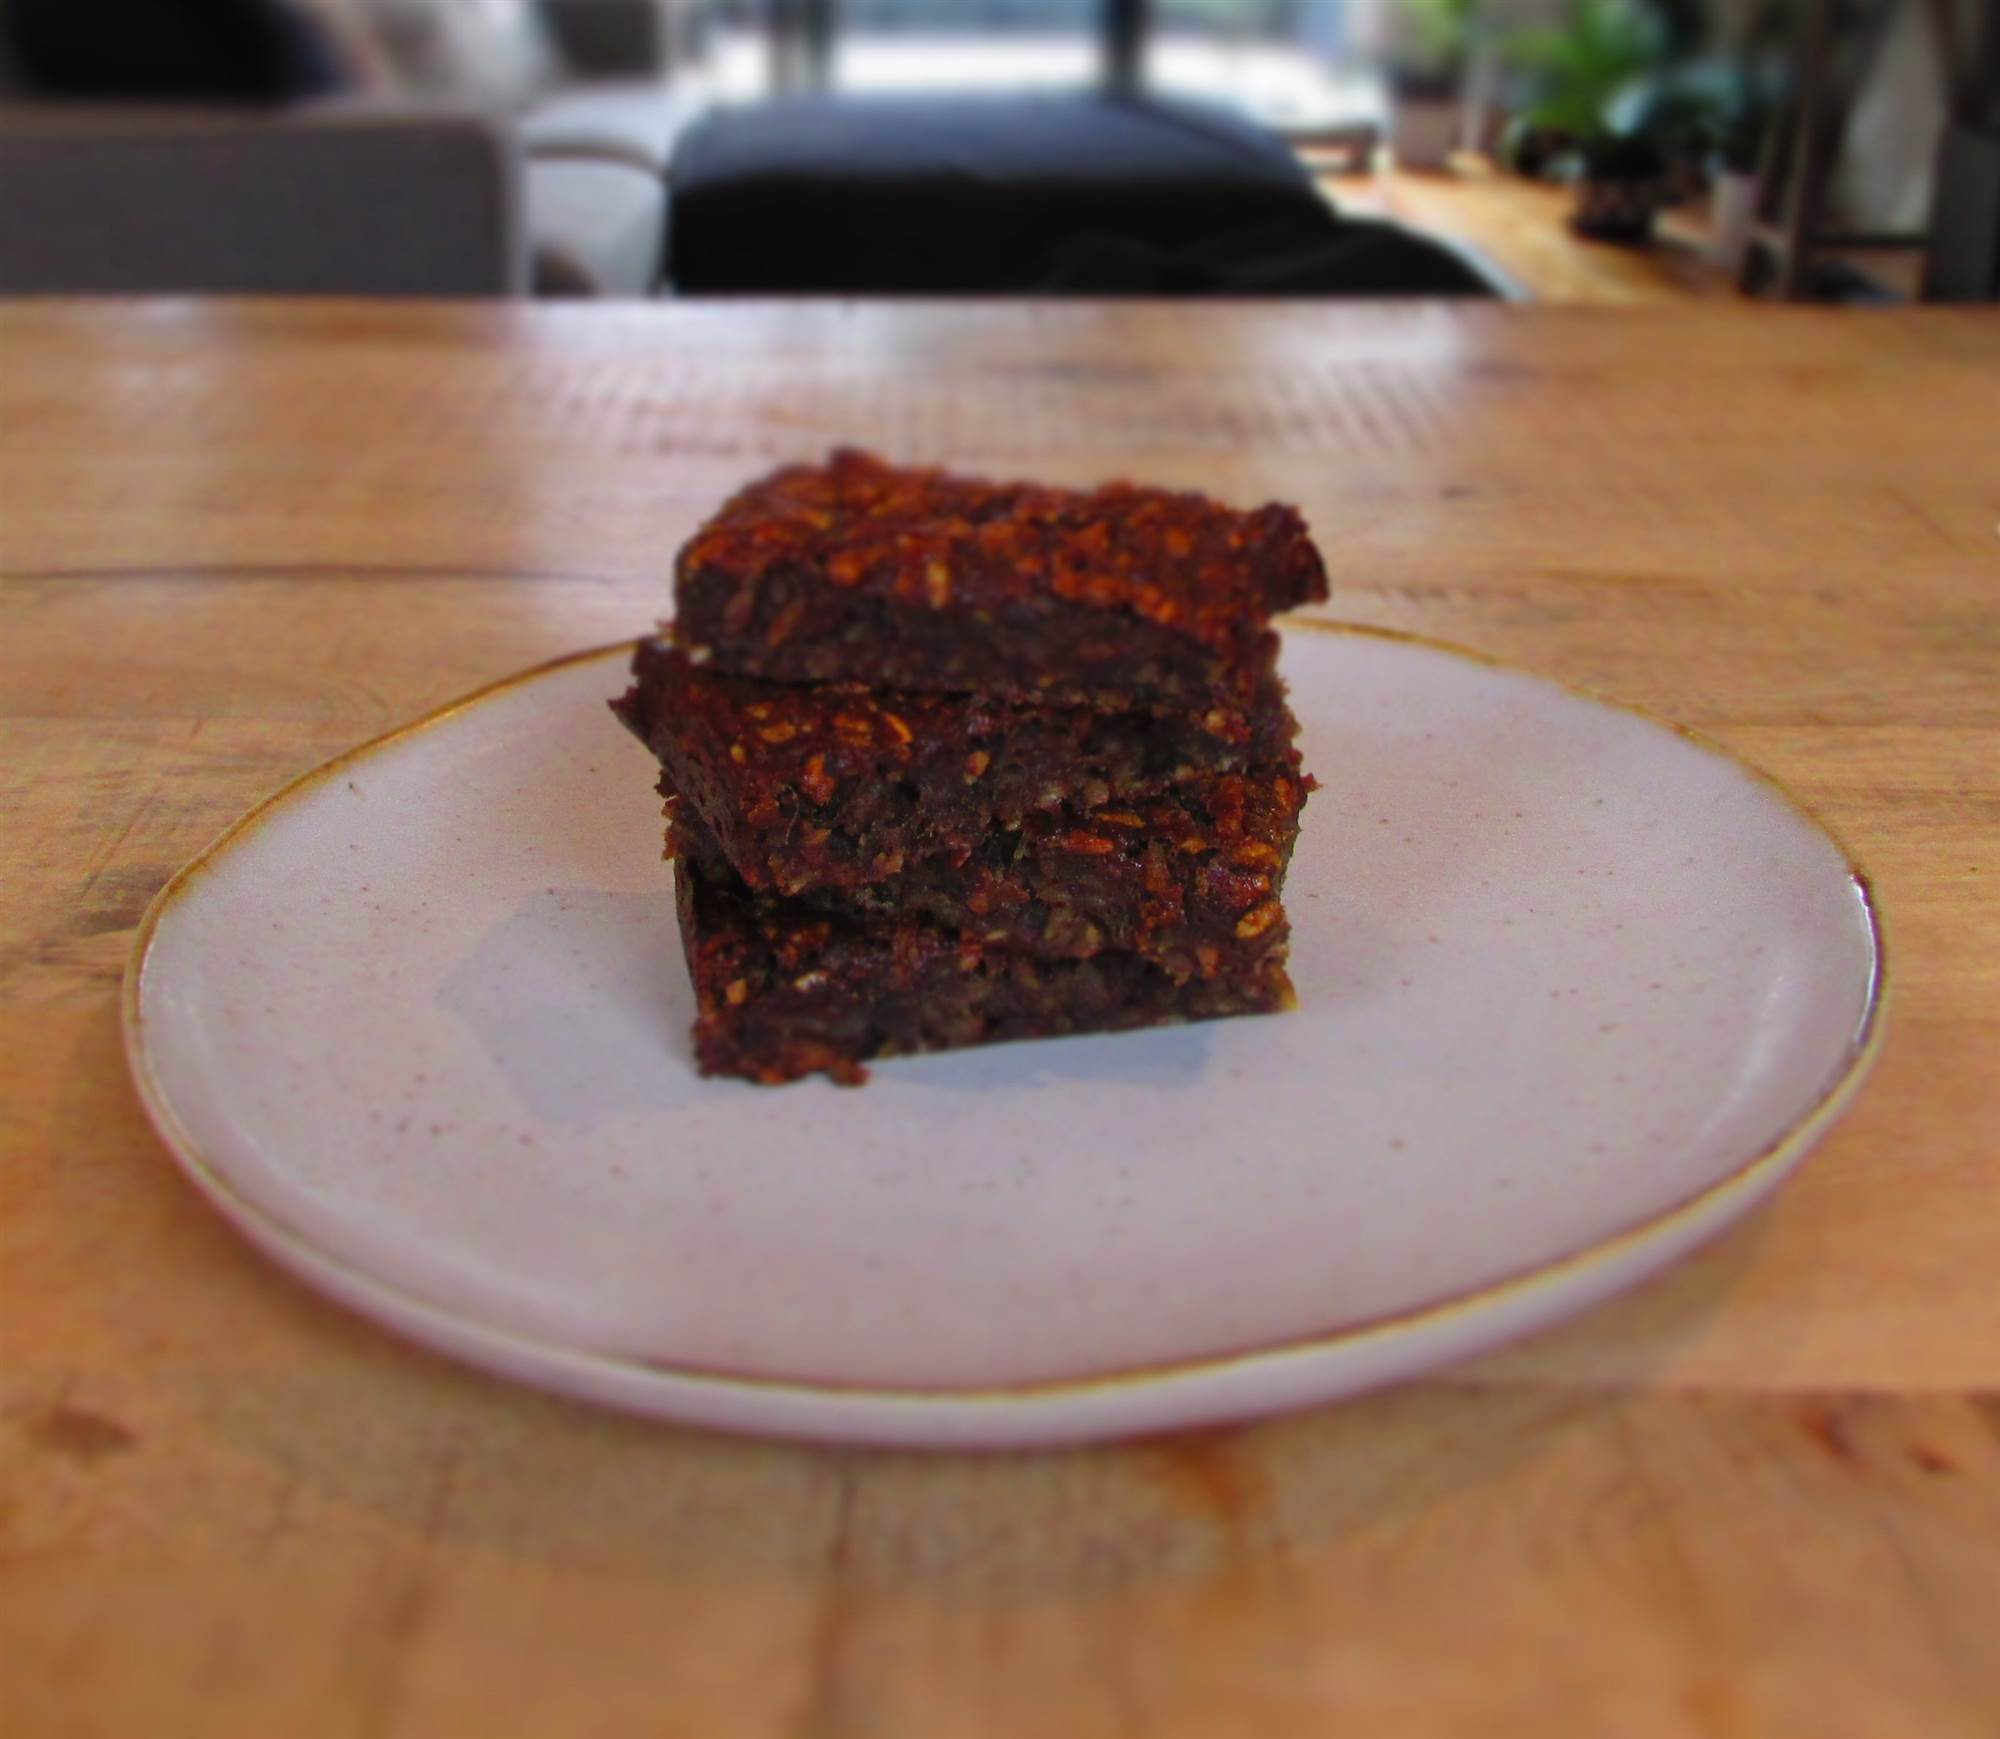 Recipe: Peanut Butter and Date Bars